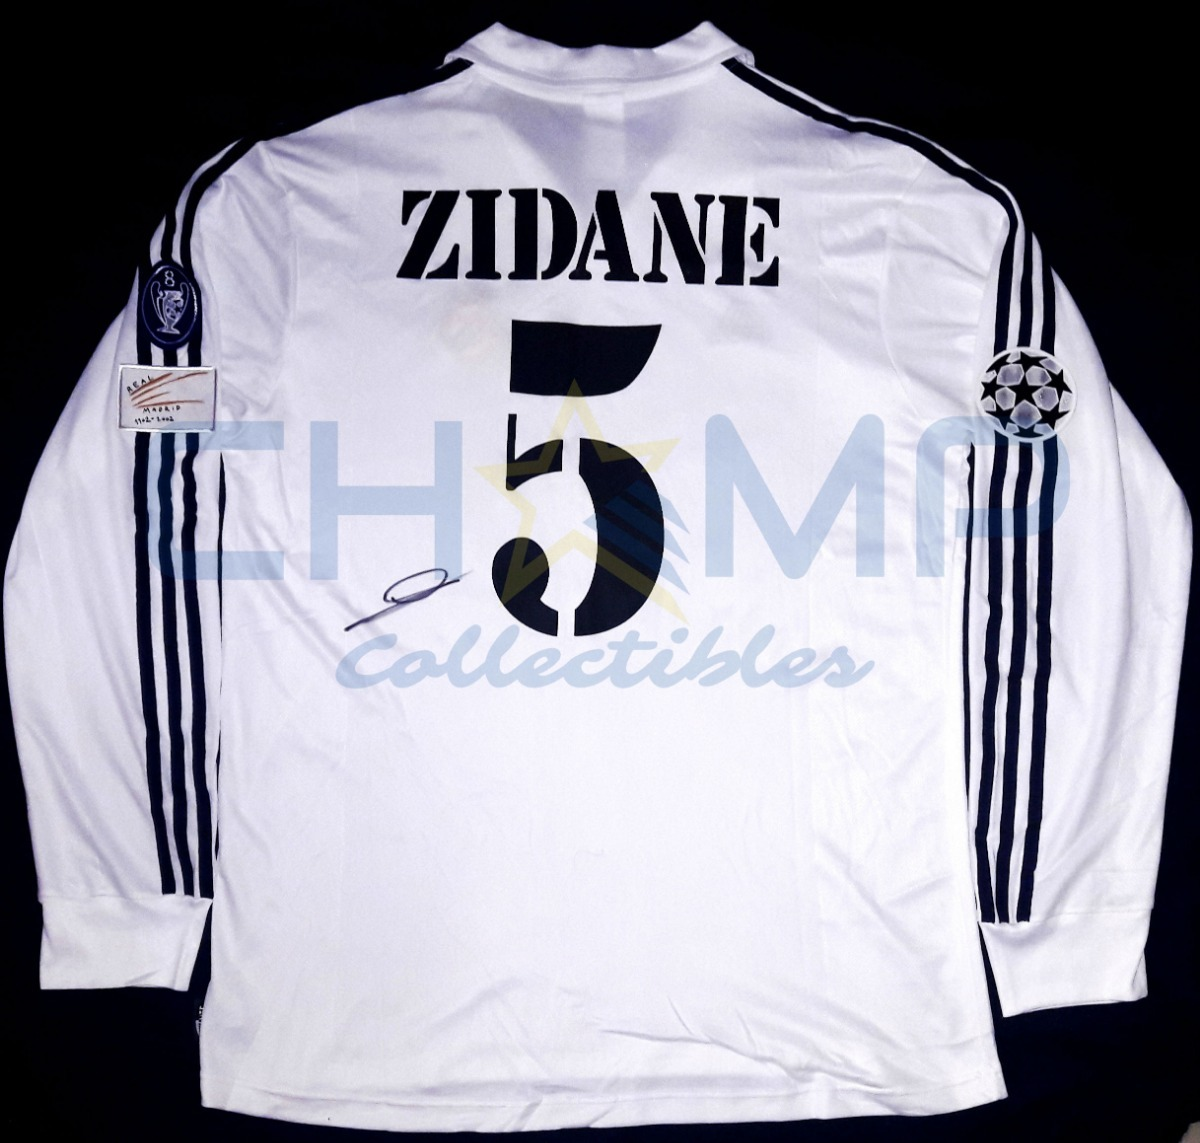 best website 3f925 ed04c Jersey Autografiado Zinedine Zidane Real Madrid Centenario